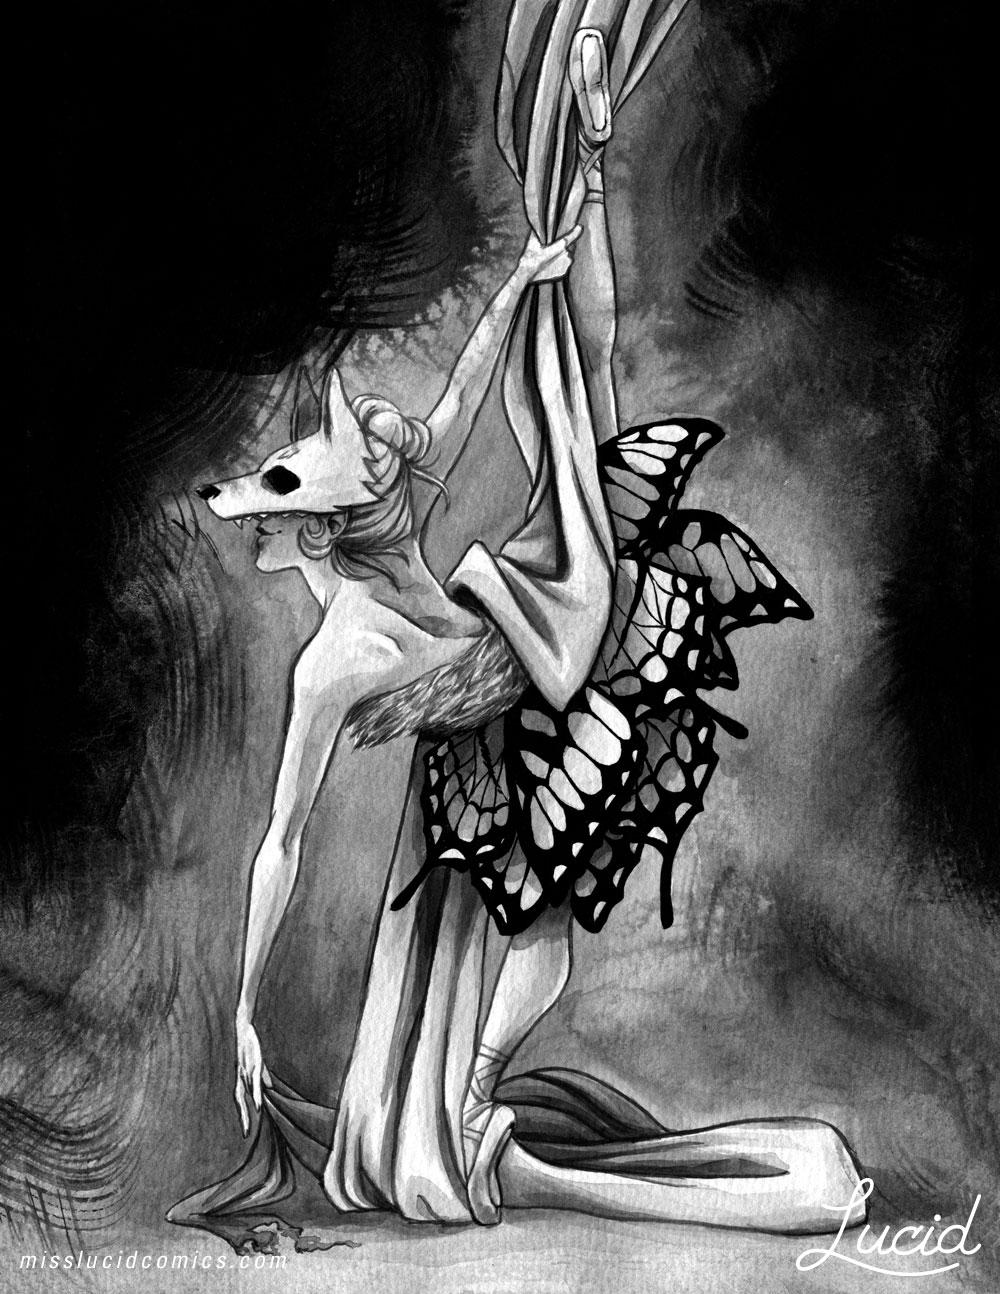 Vixen: Swallowtail